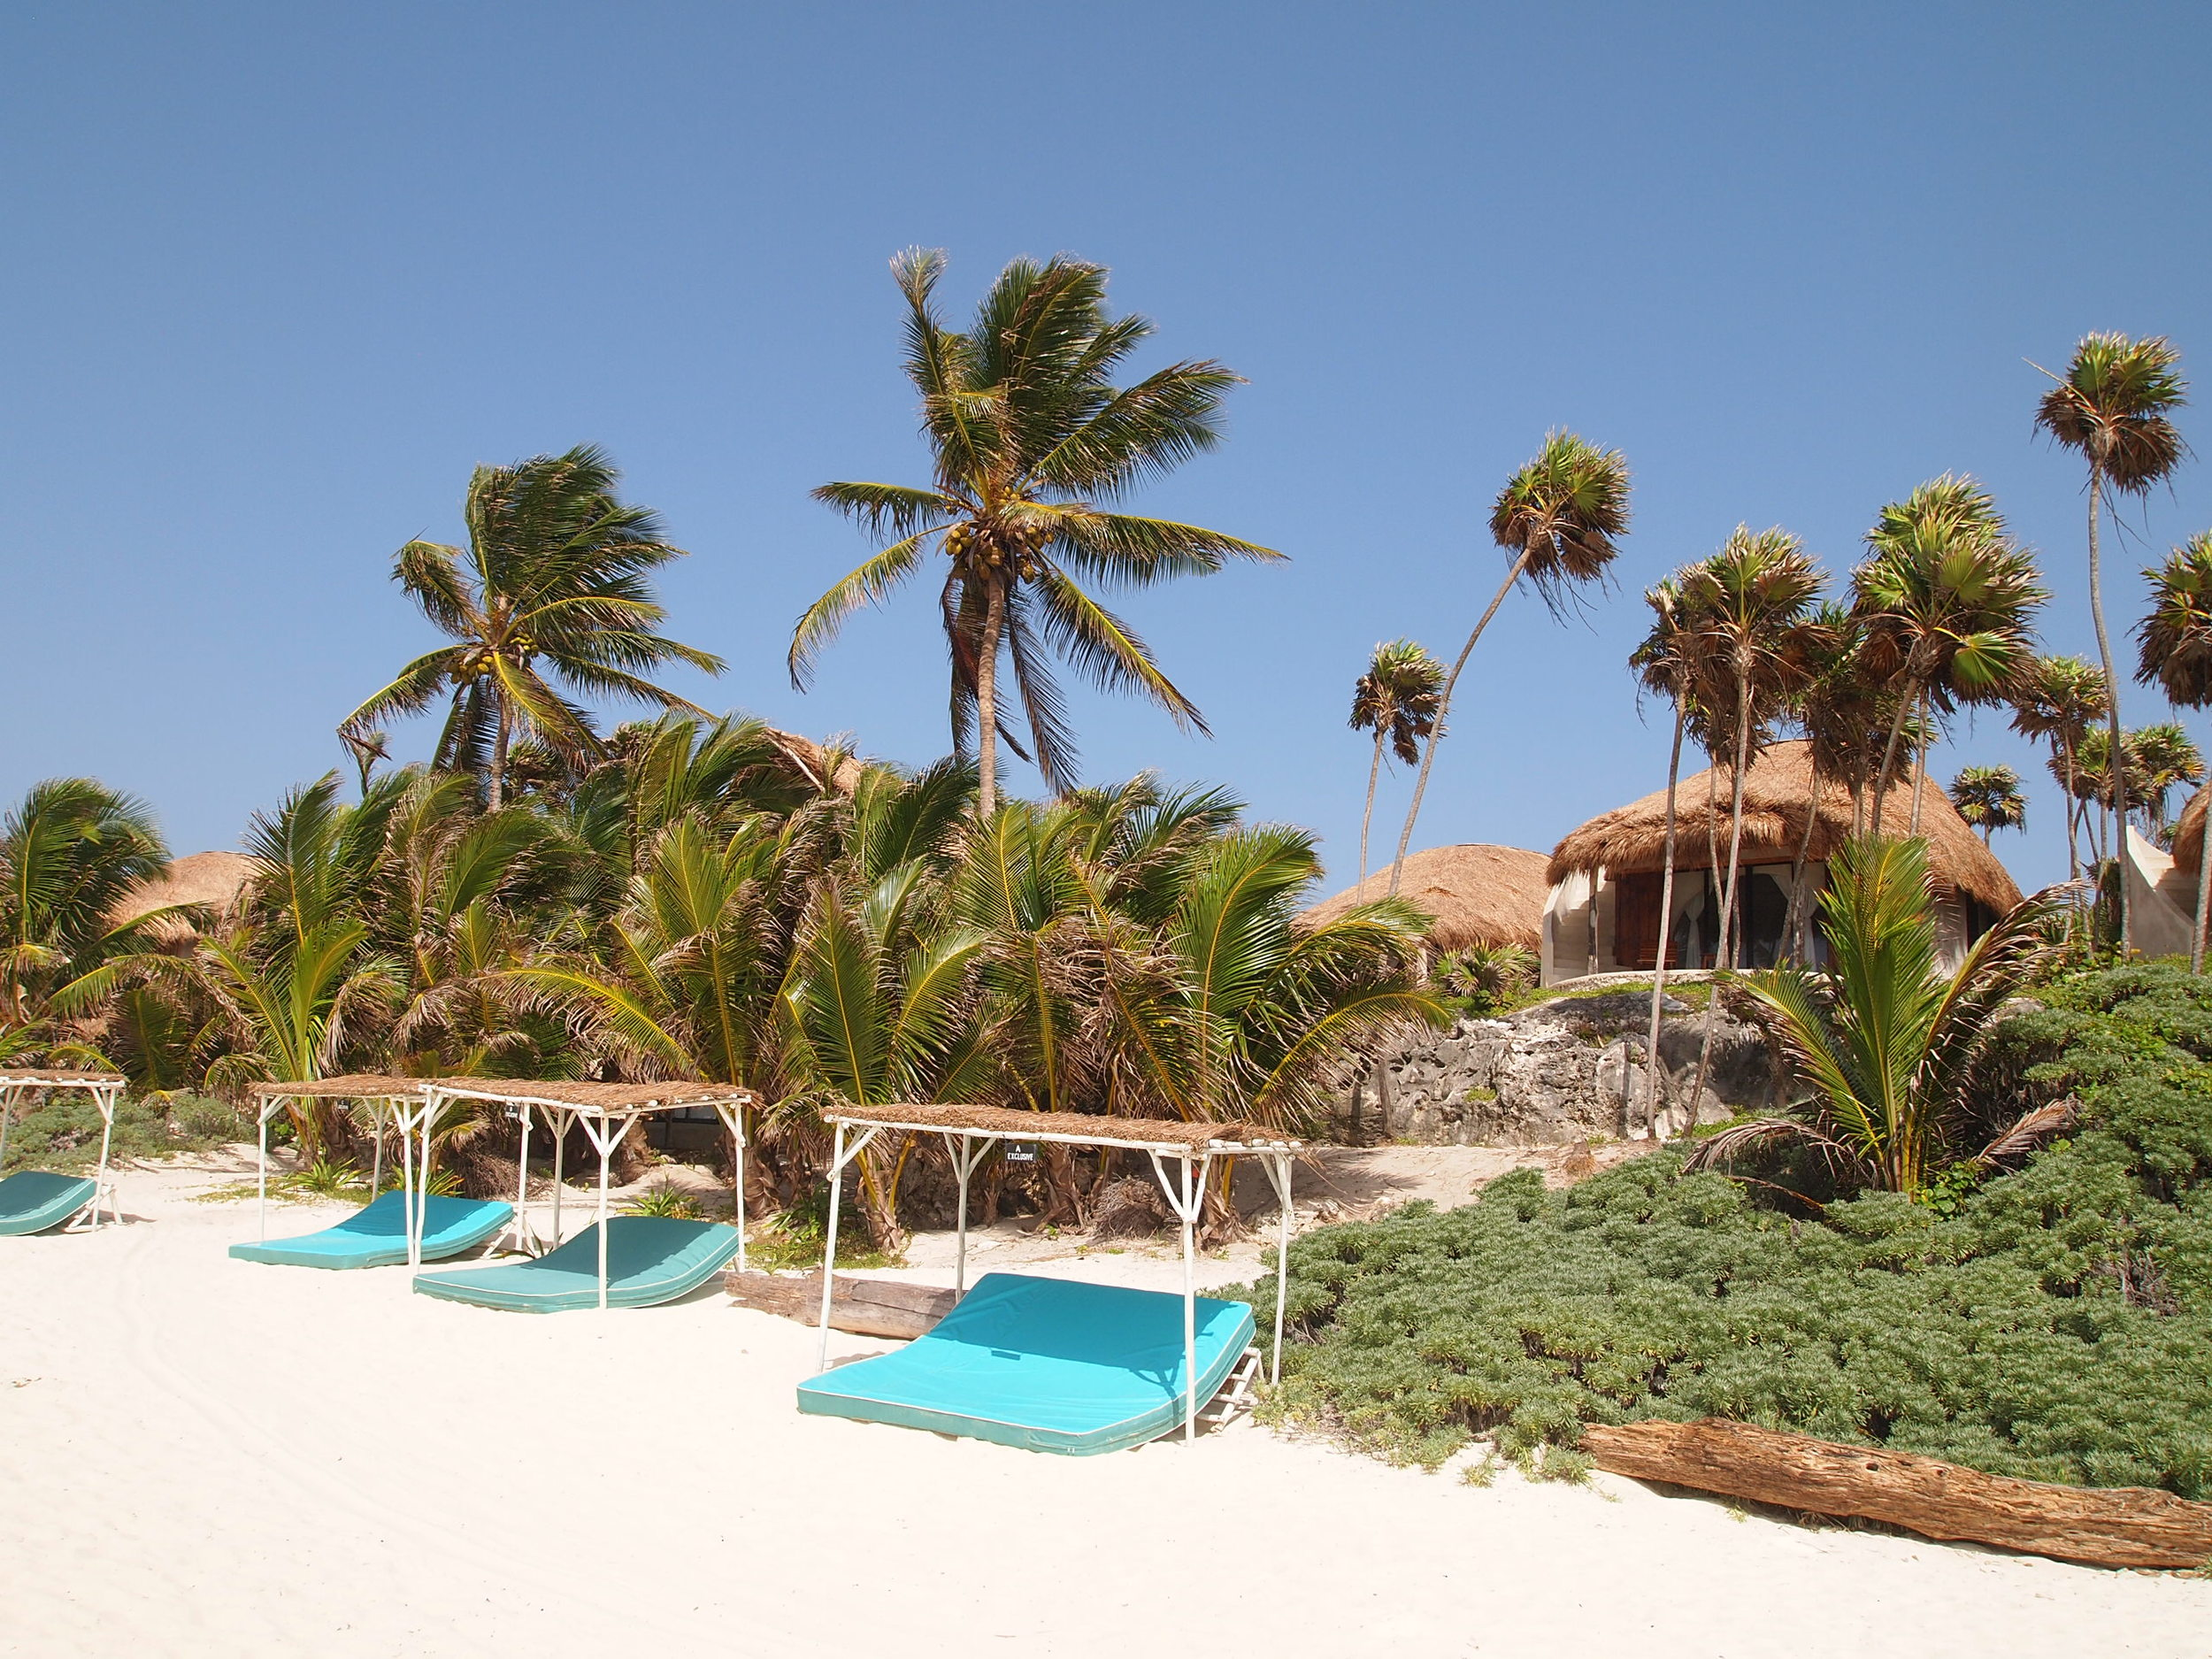 The 900m beach with its handmade beach palapas